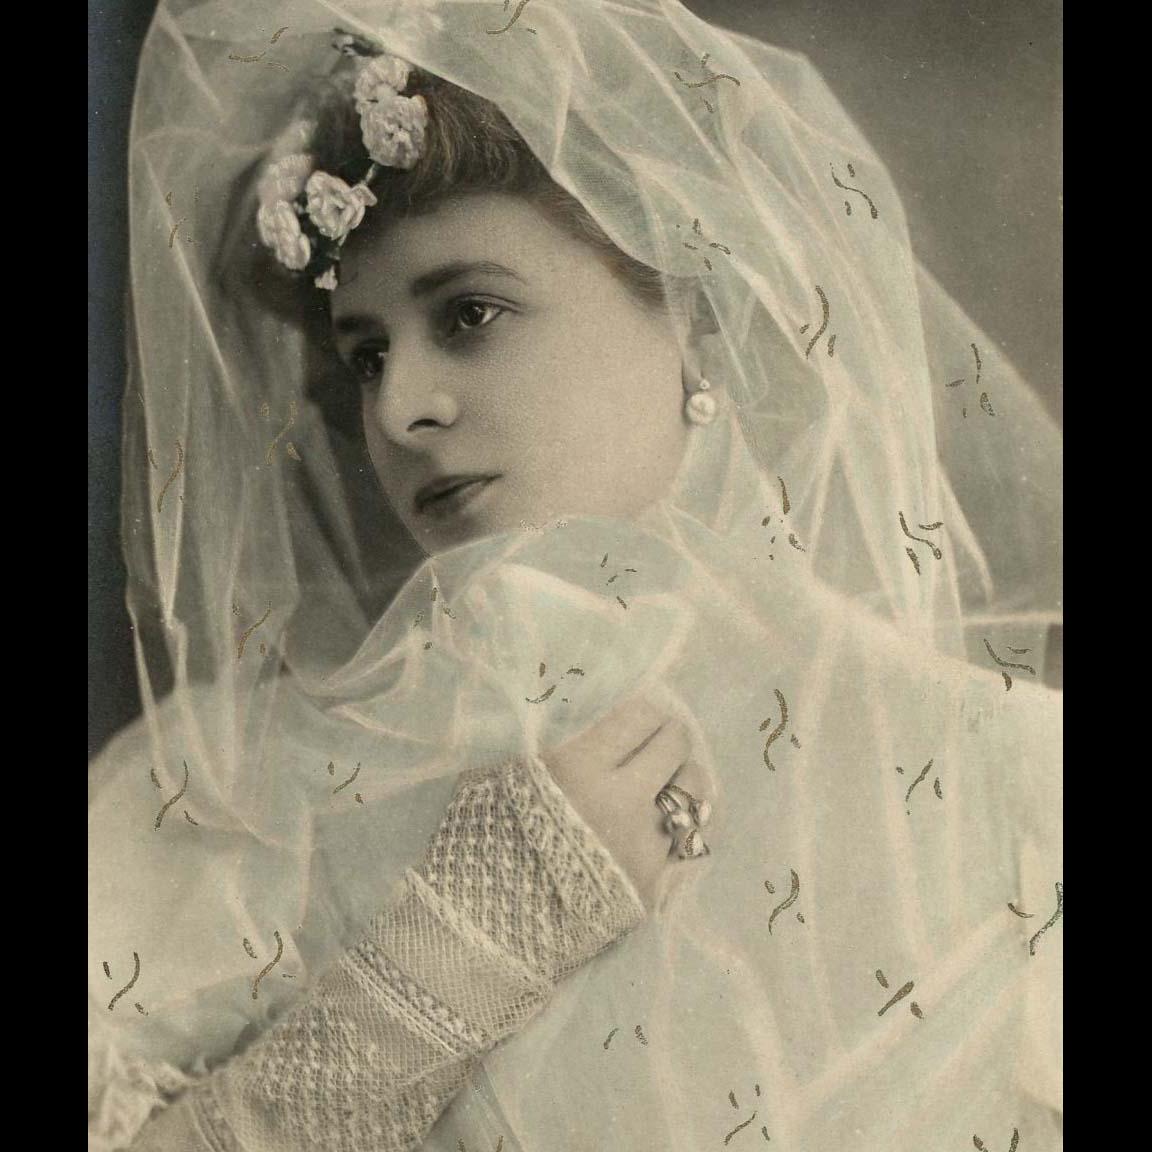 Belle Epoque Actress Dressed as Bride Reutlinger Real Photo Hand-Detailed Postcard